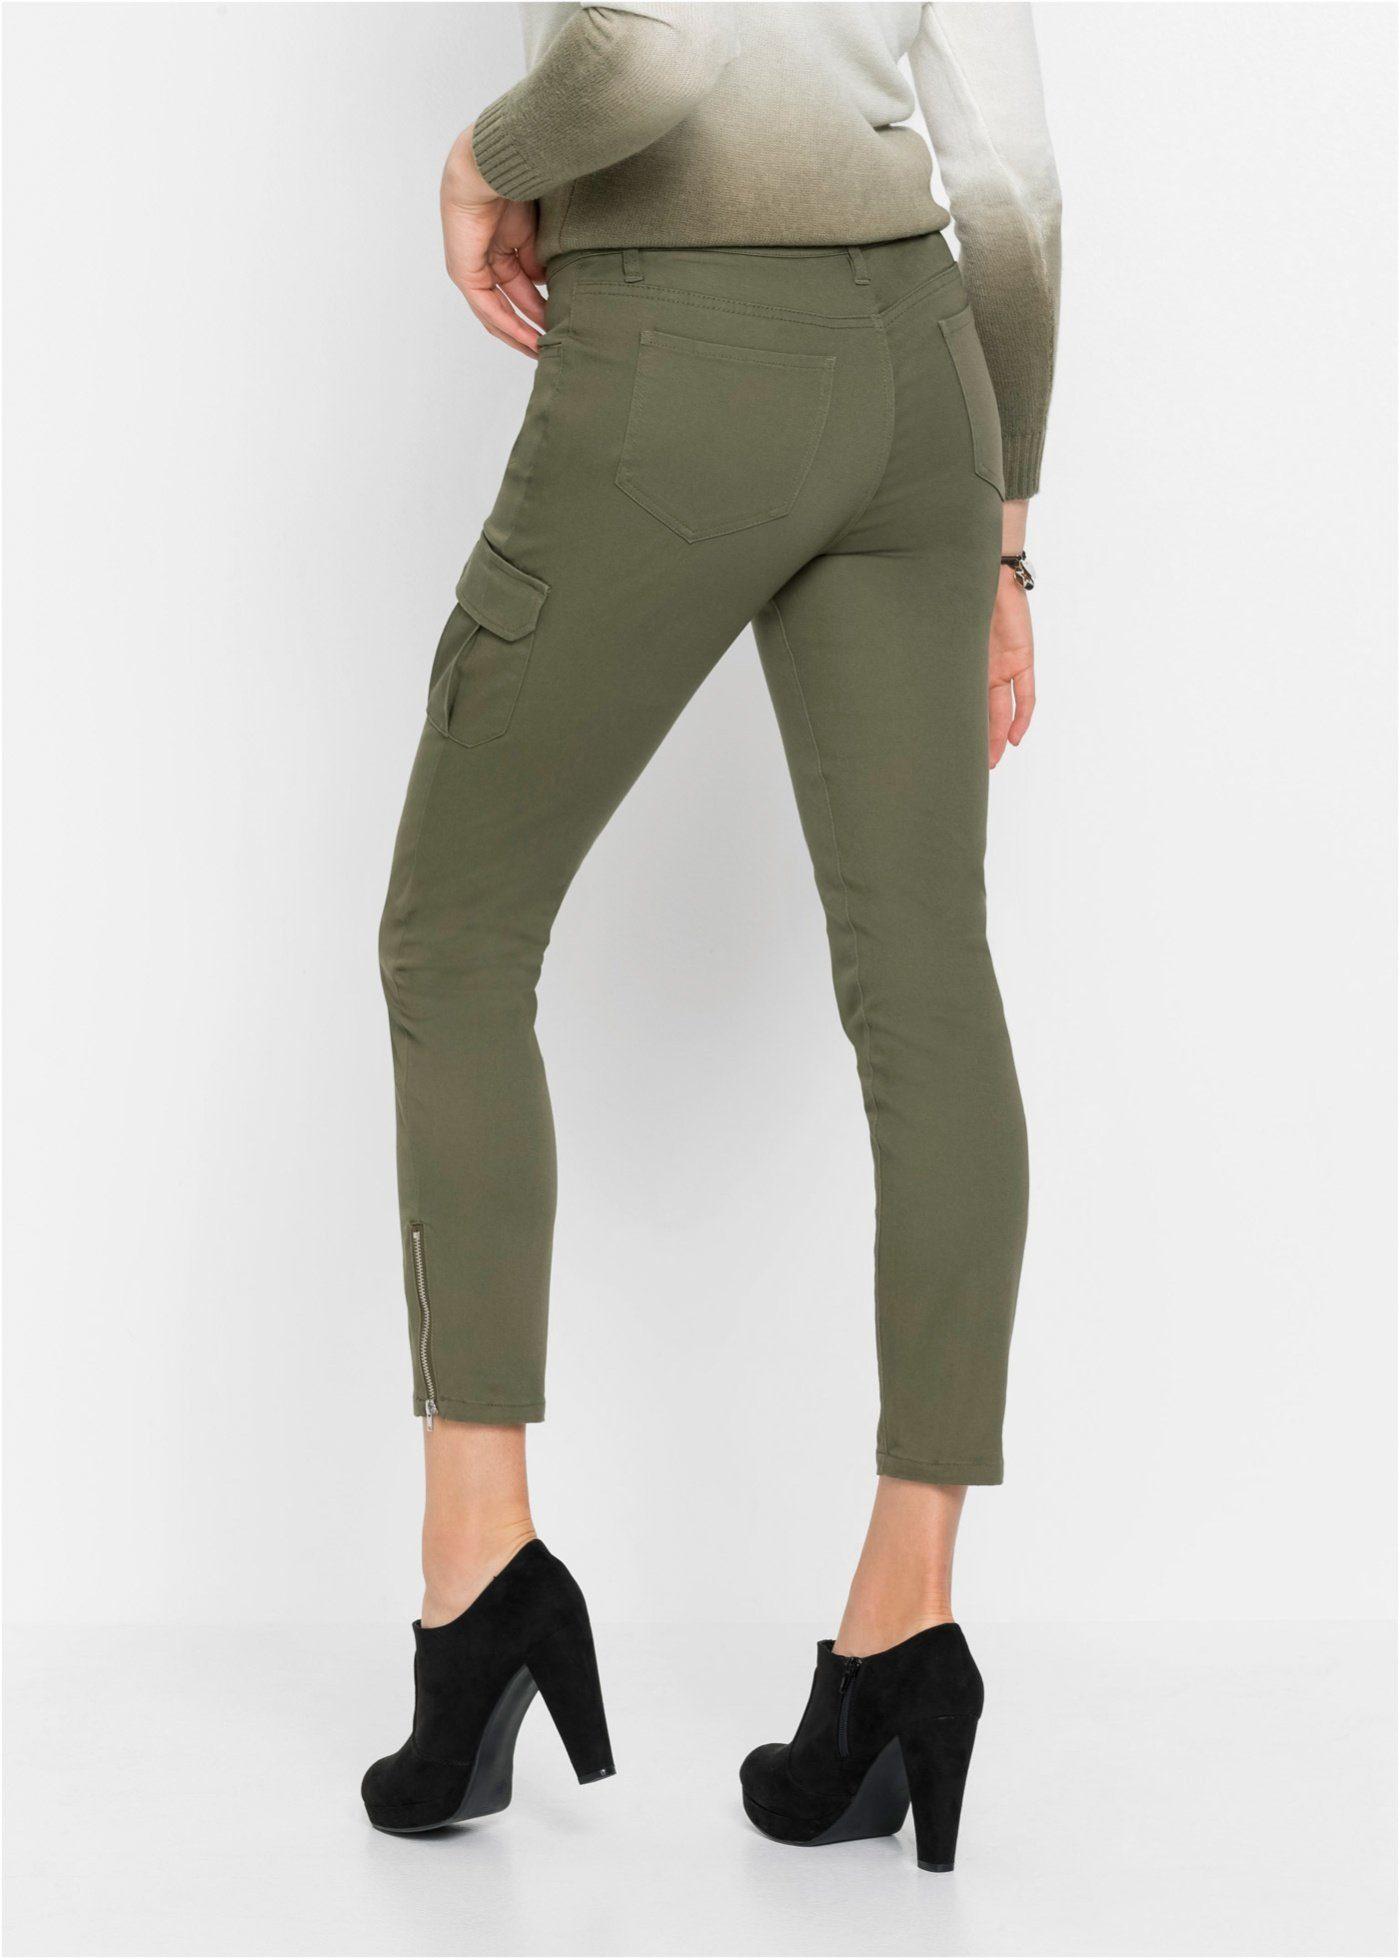 bonprix 7/8-Jeans Skinny Jeans mit offener Knopfleiste